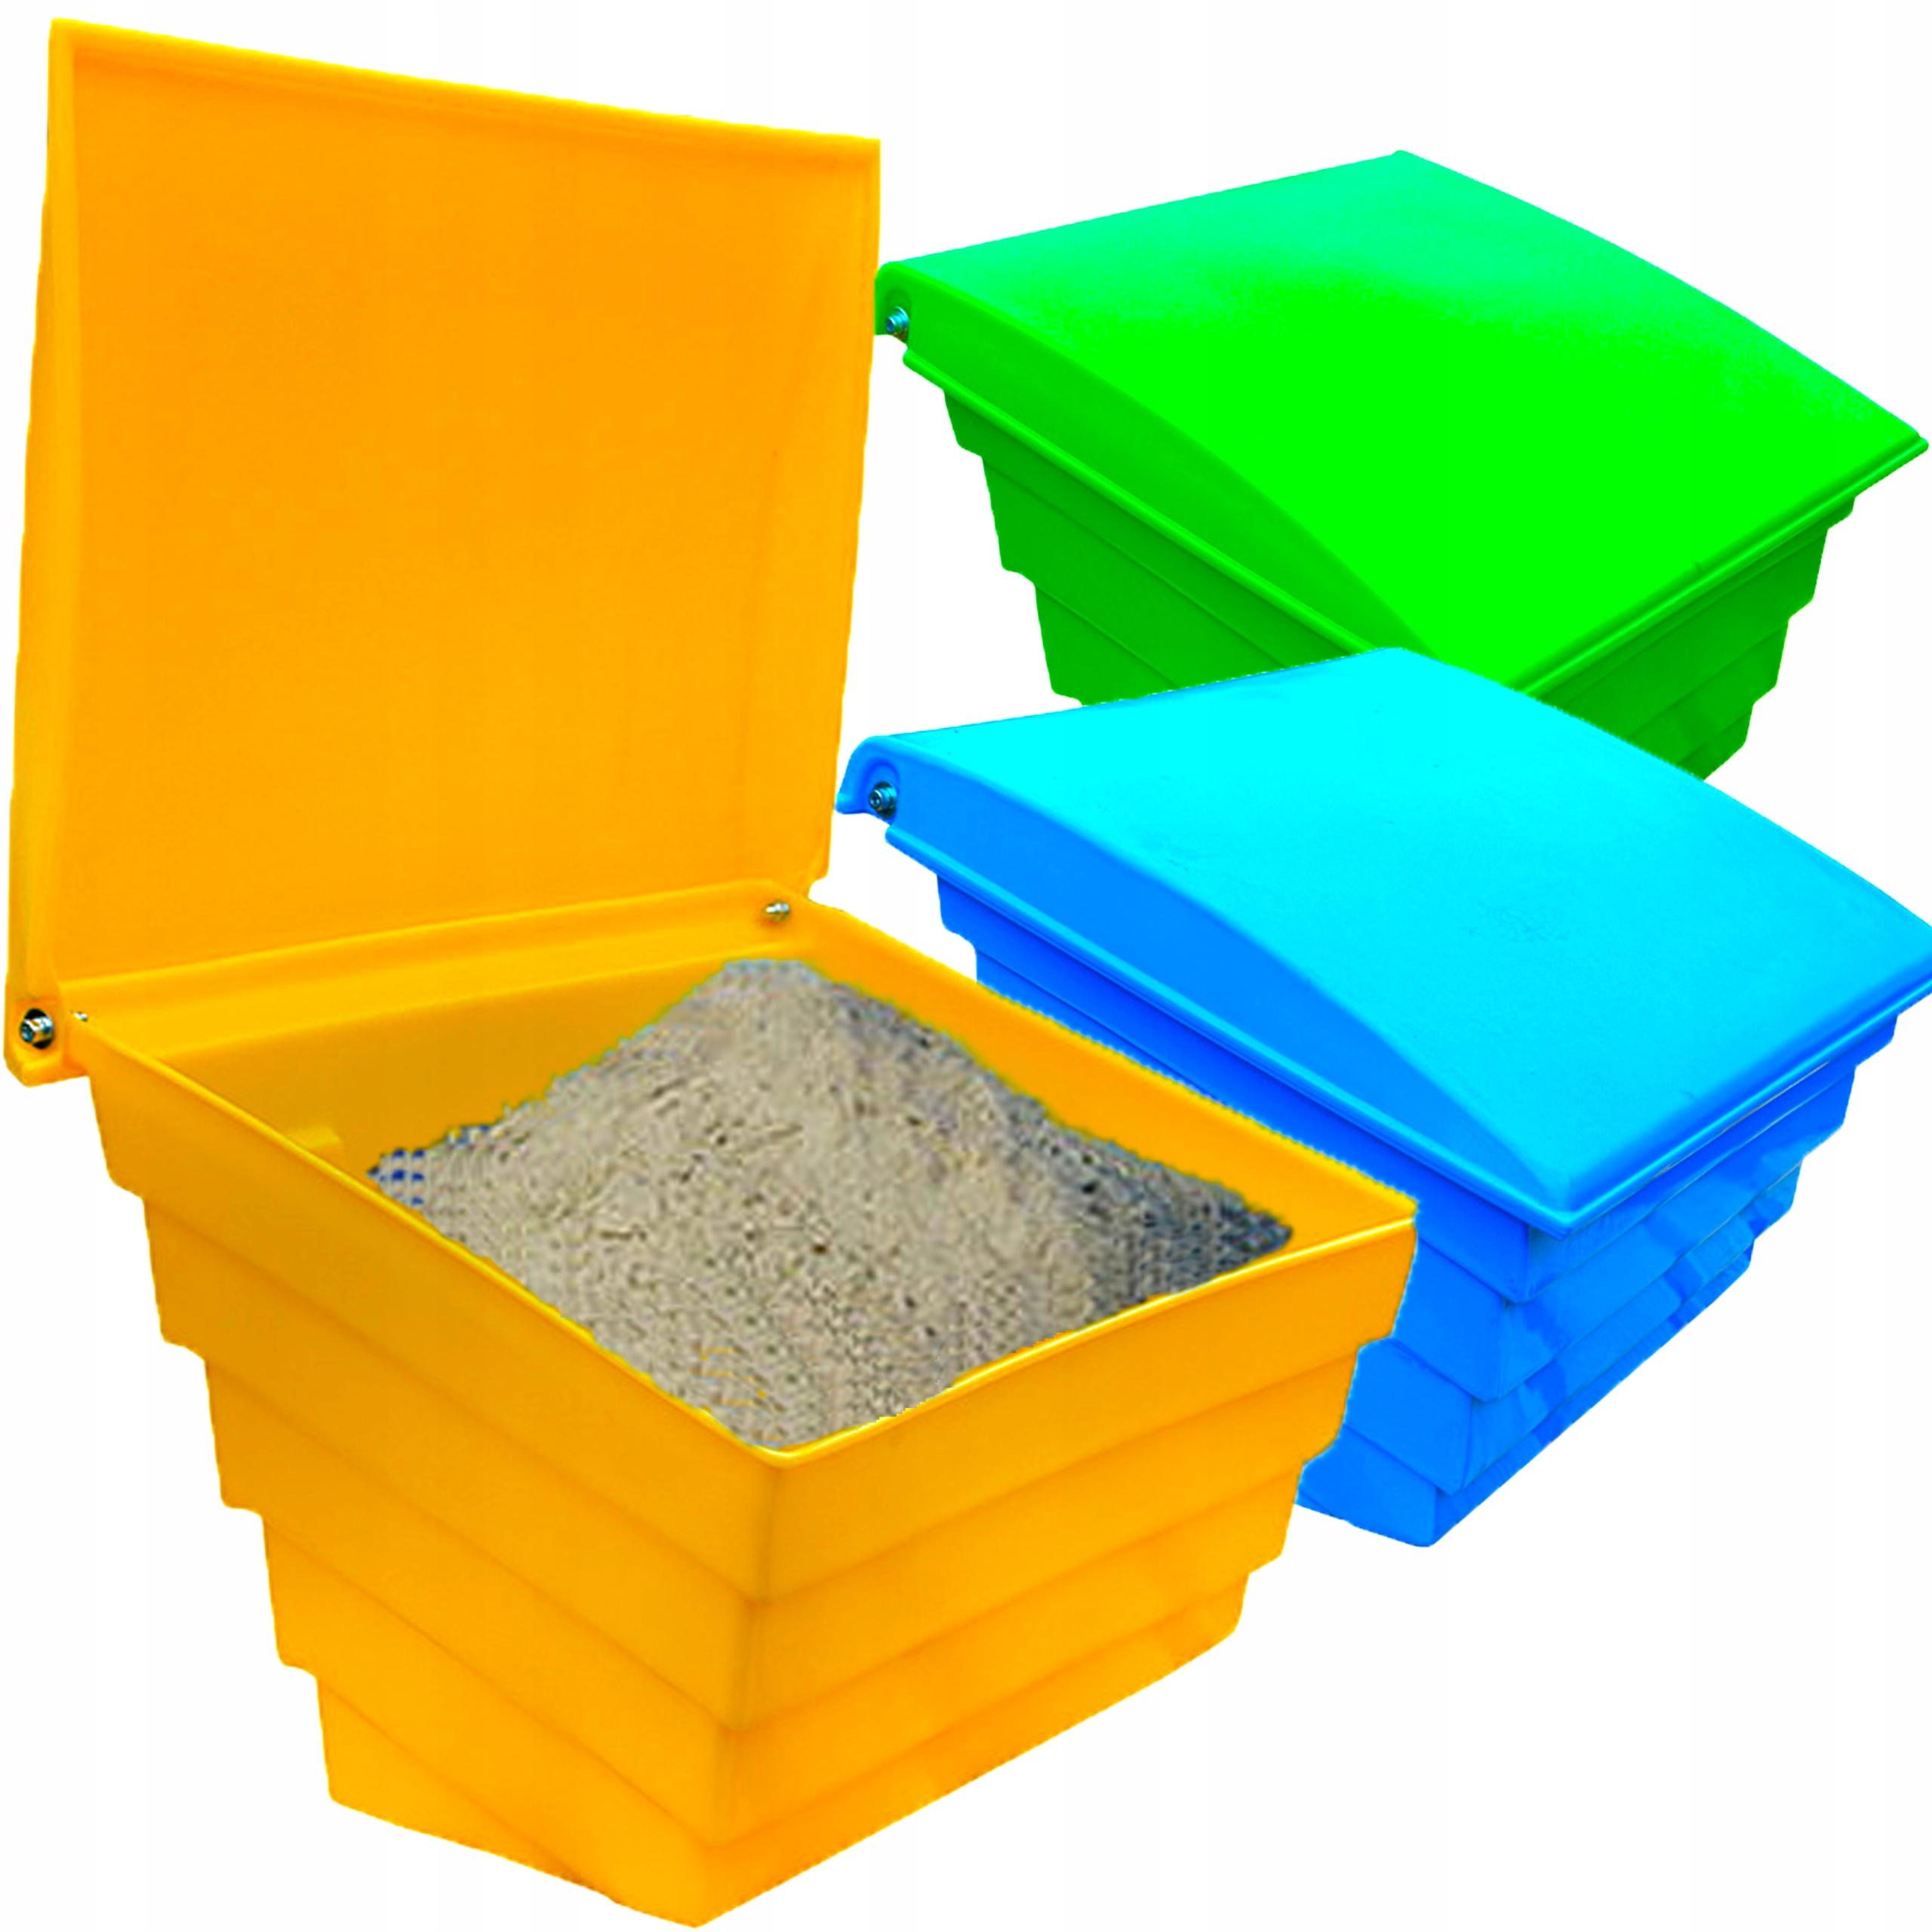 POJEMNIK na piasek sól sorbent skrzynia 70L 100KG